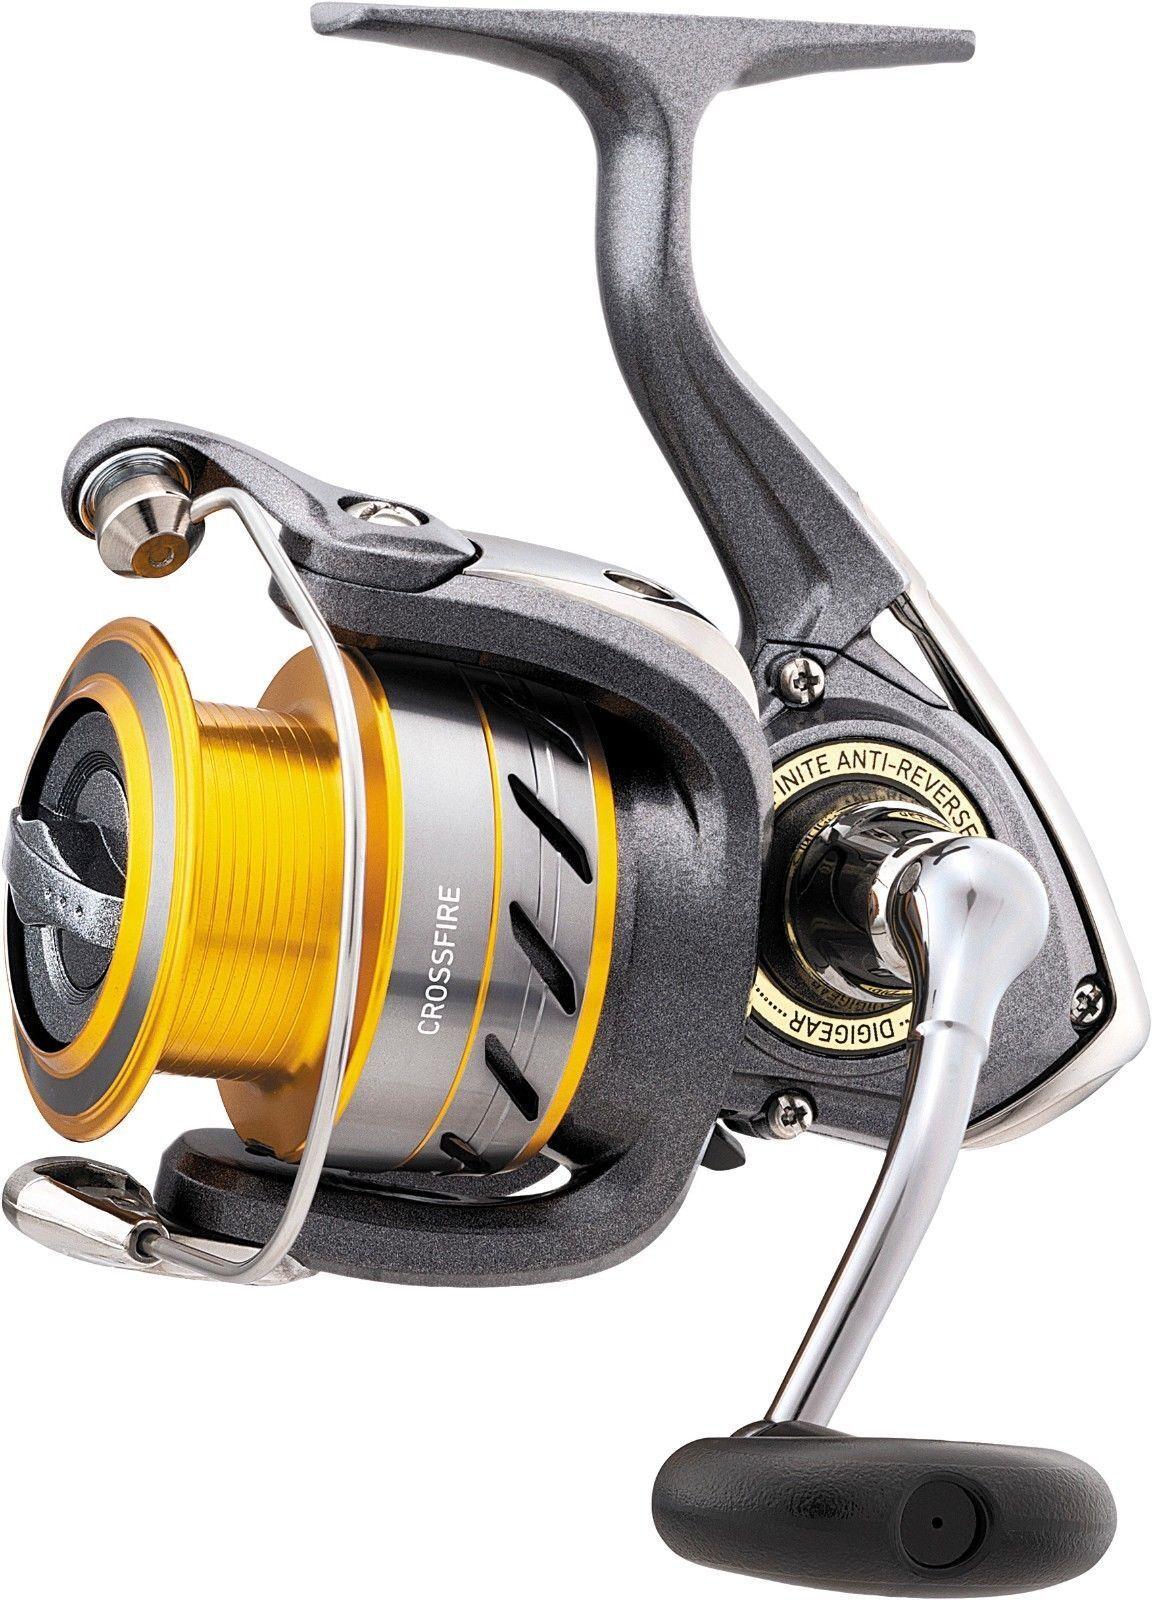 Daiwa Crossfire Coarse Match/Feeder Fishing Reel Größes 2500 3000 3000 3000 4000 5000 ddeb3e